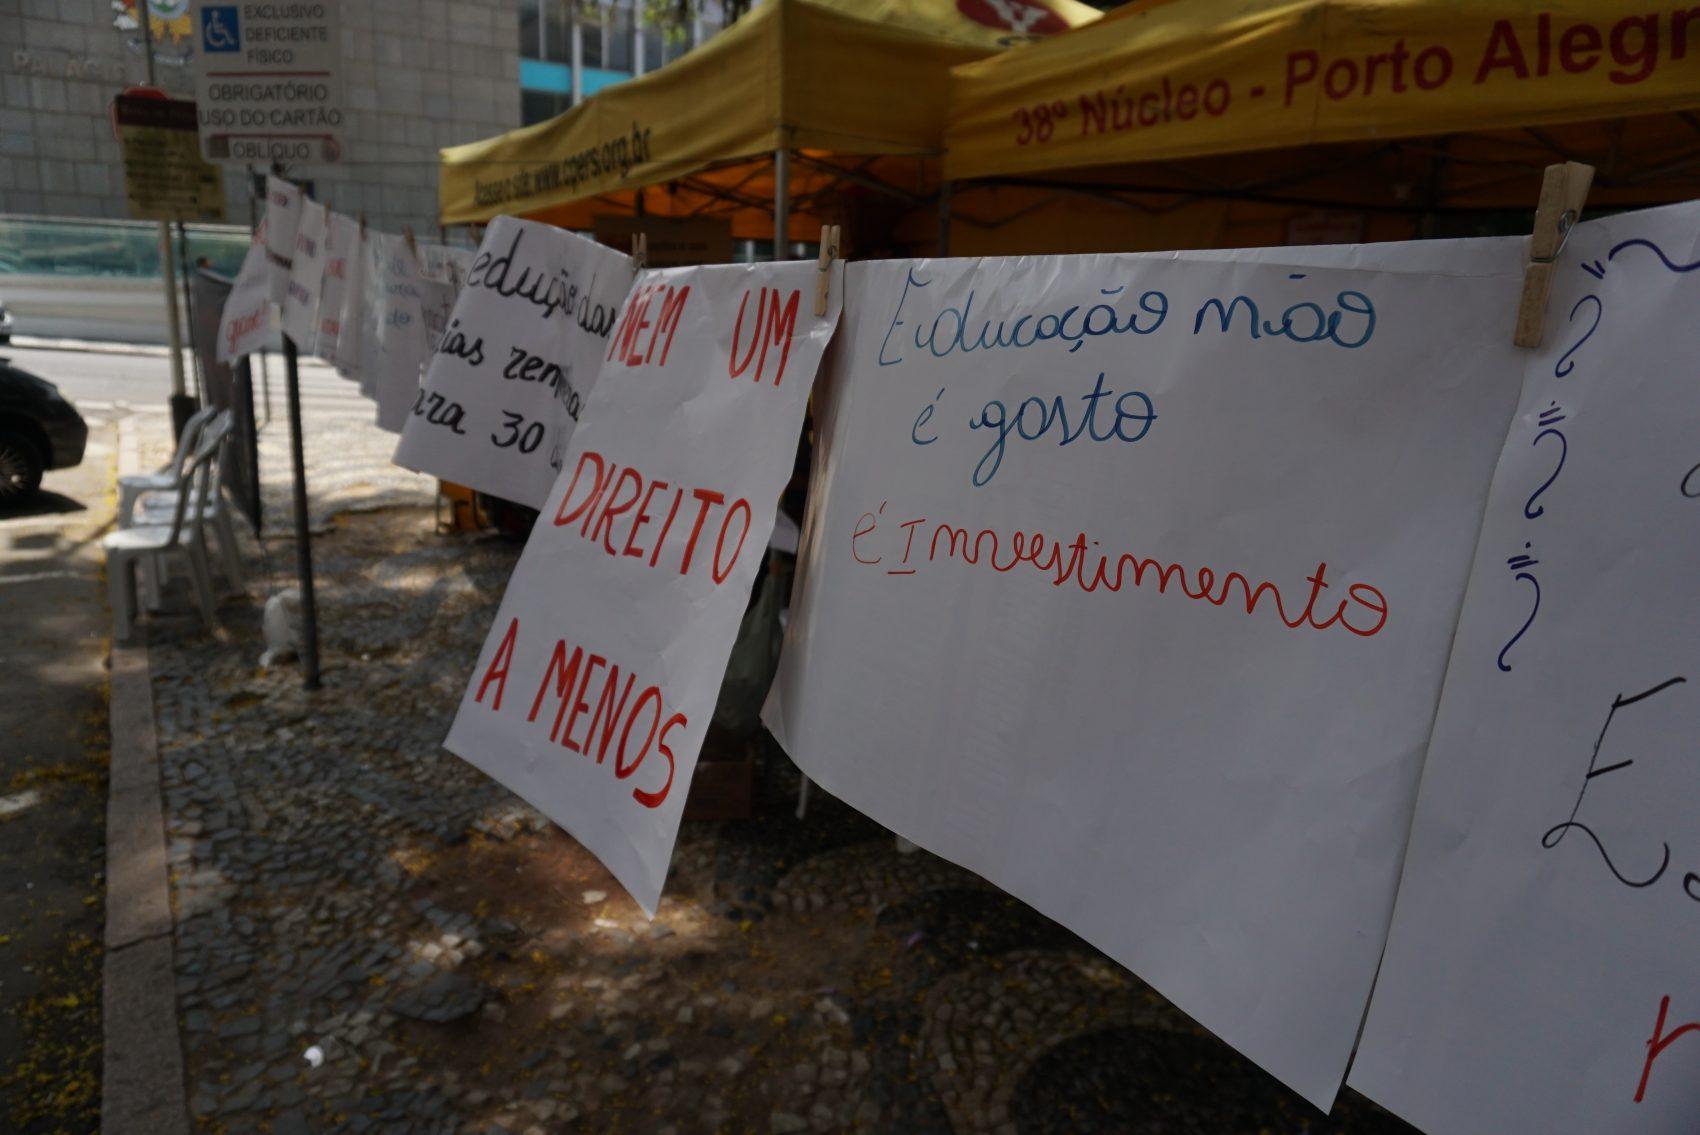 Greve dos professores estaduais - novembro de 2019